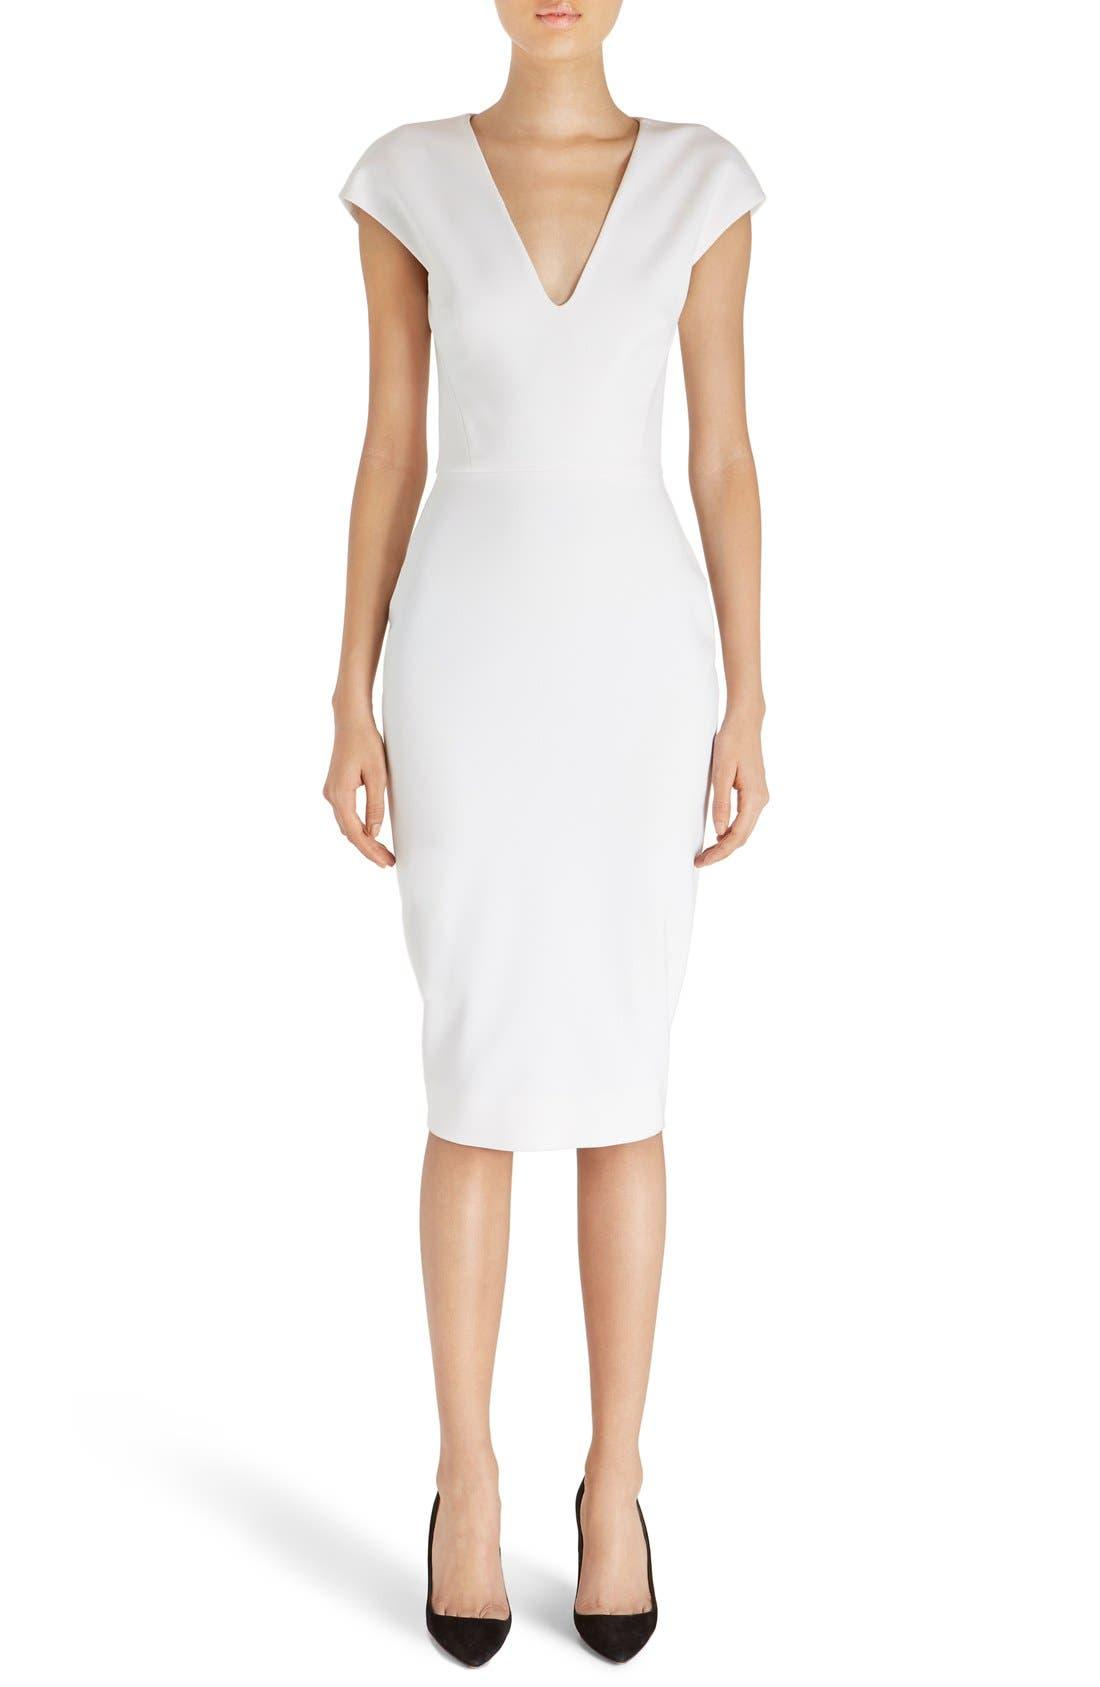 Alternate Image 1 Selected - Victoria Beckham Cap Sleeve Cotton Blend Sheath Dress